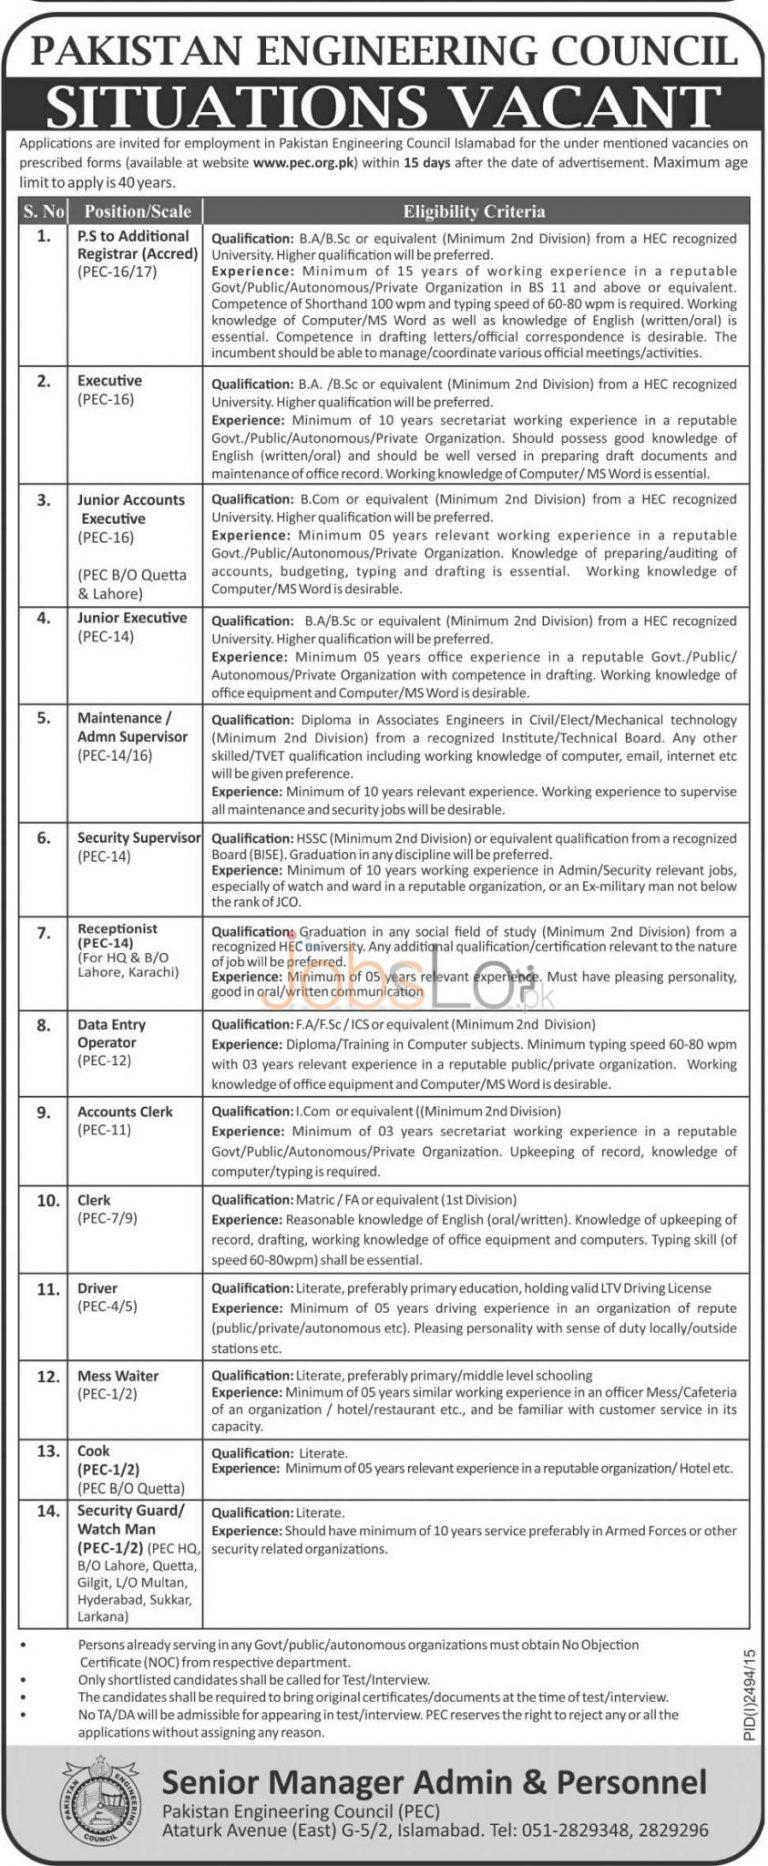 Pakistan Engineering Council PEC Jobs 2015 Application Form Download